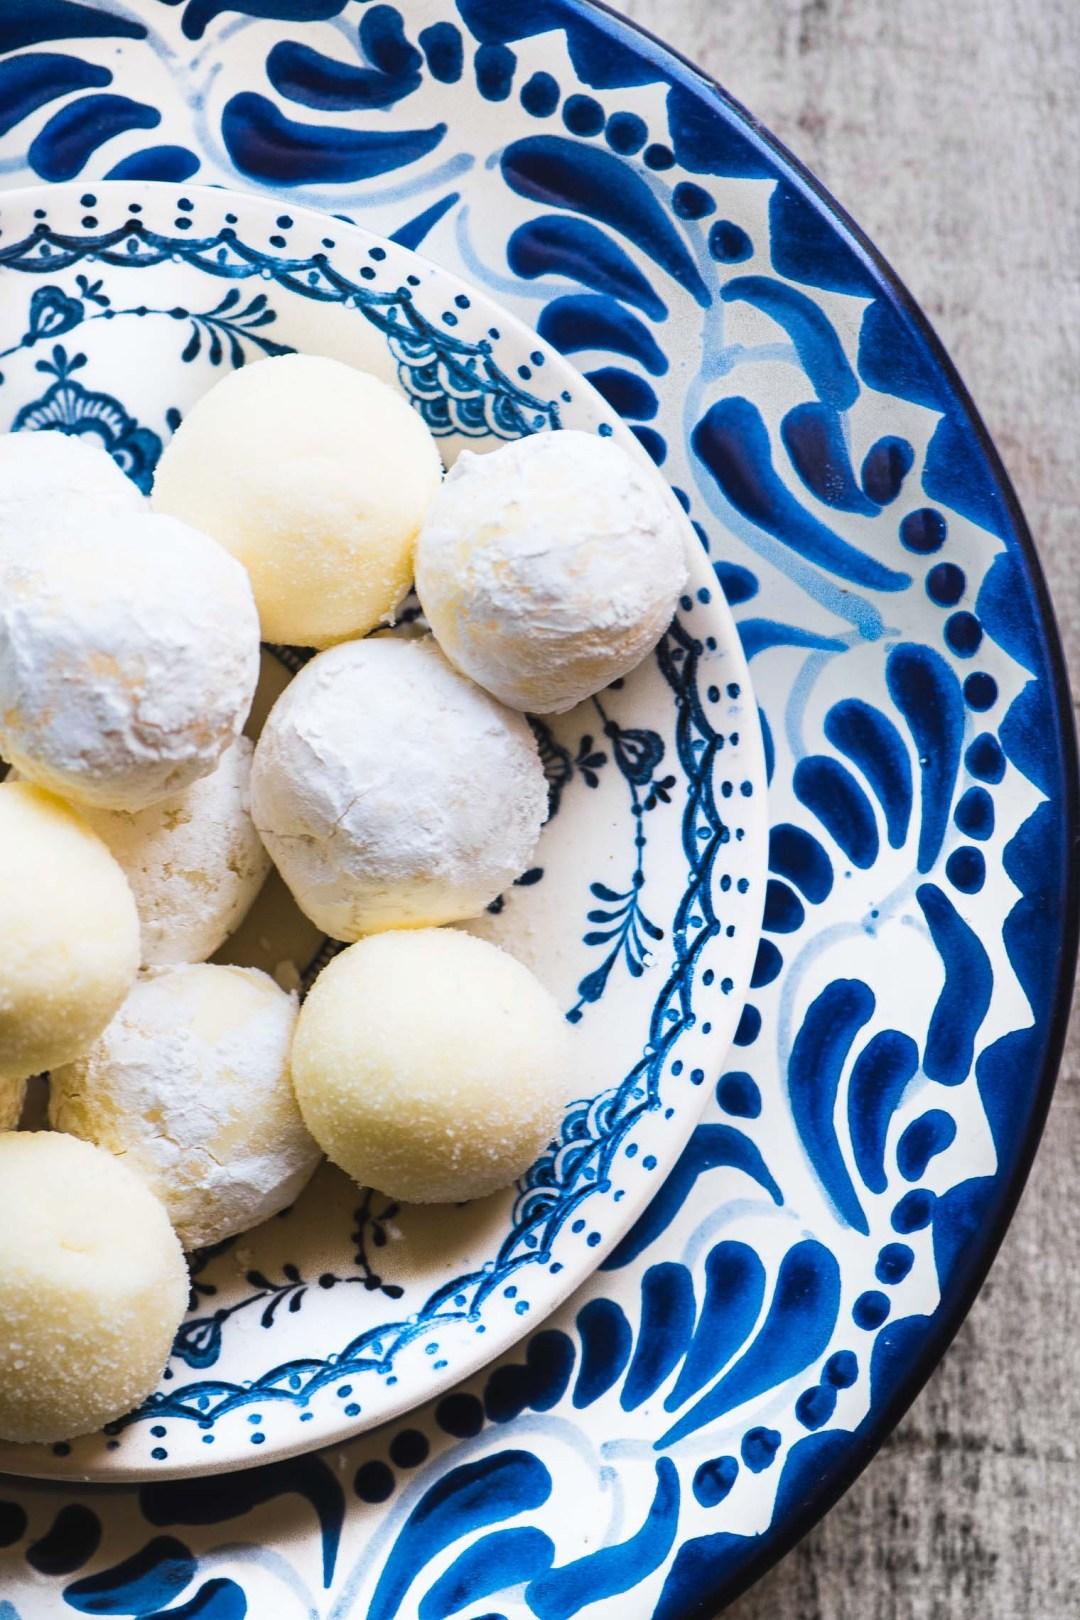 Fresh Lemon Truffles coated in sugar photograph